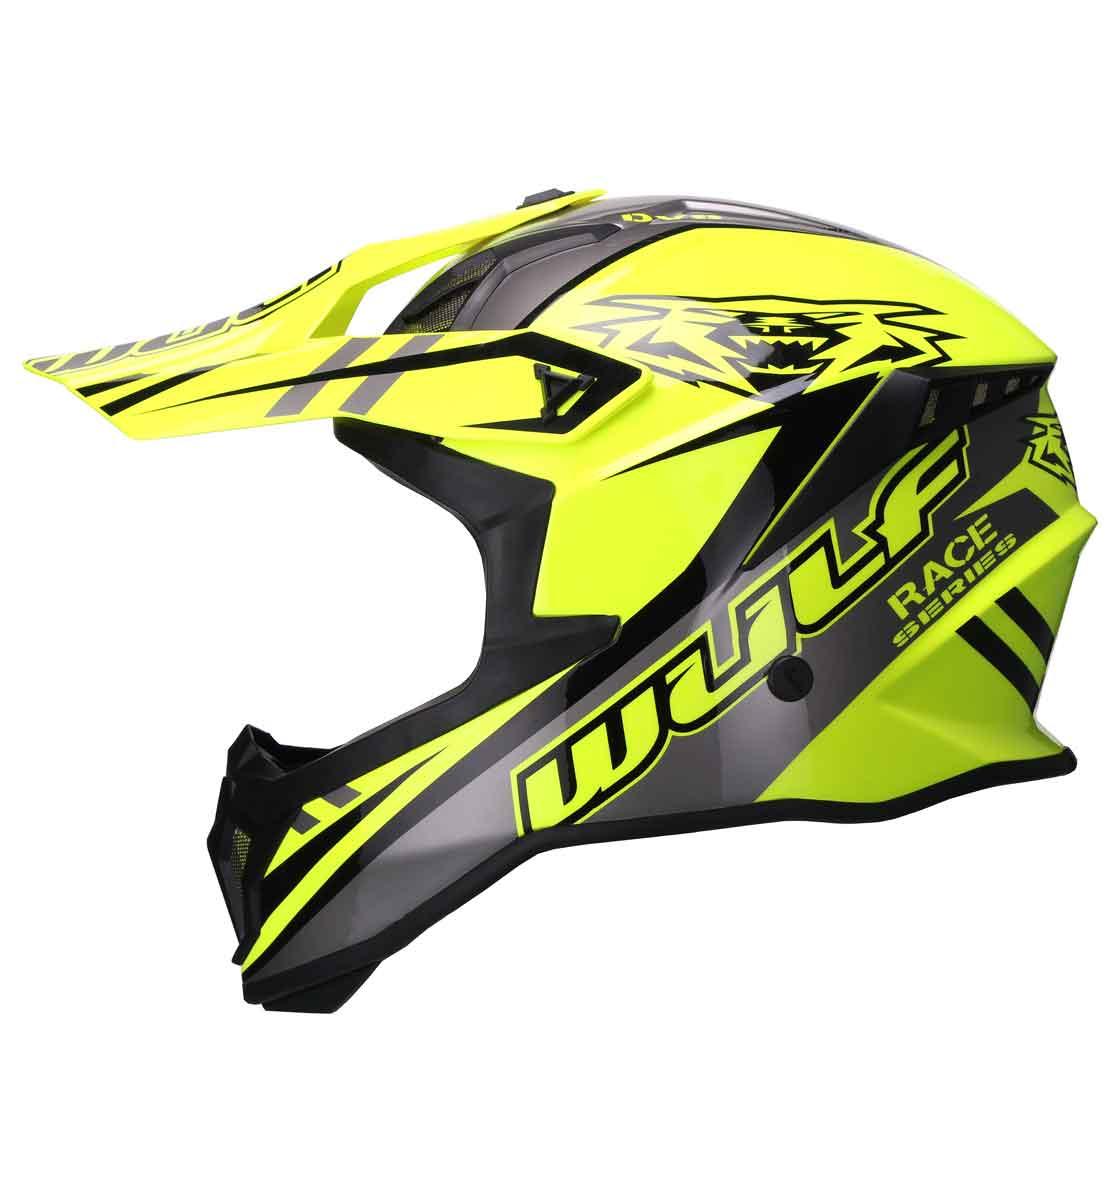 Wulfsport Race Series Helmet | Yellow | Large (59-60cm)